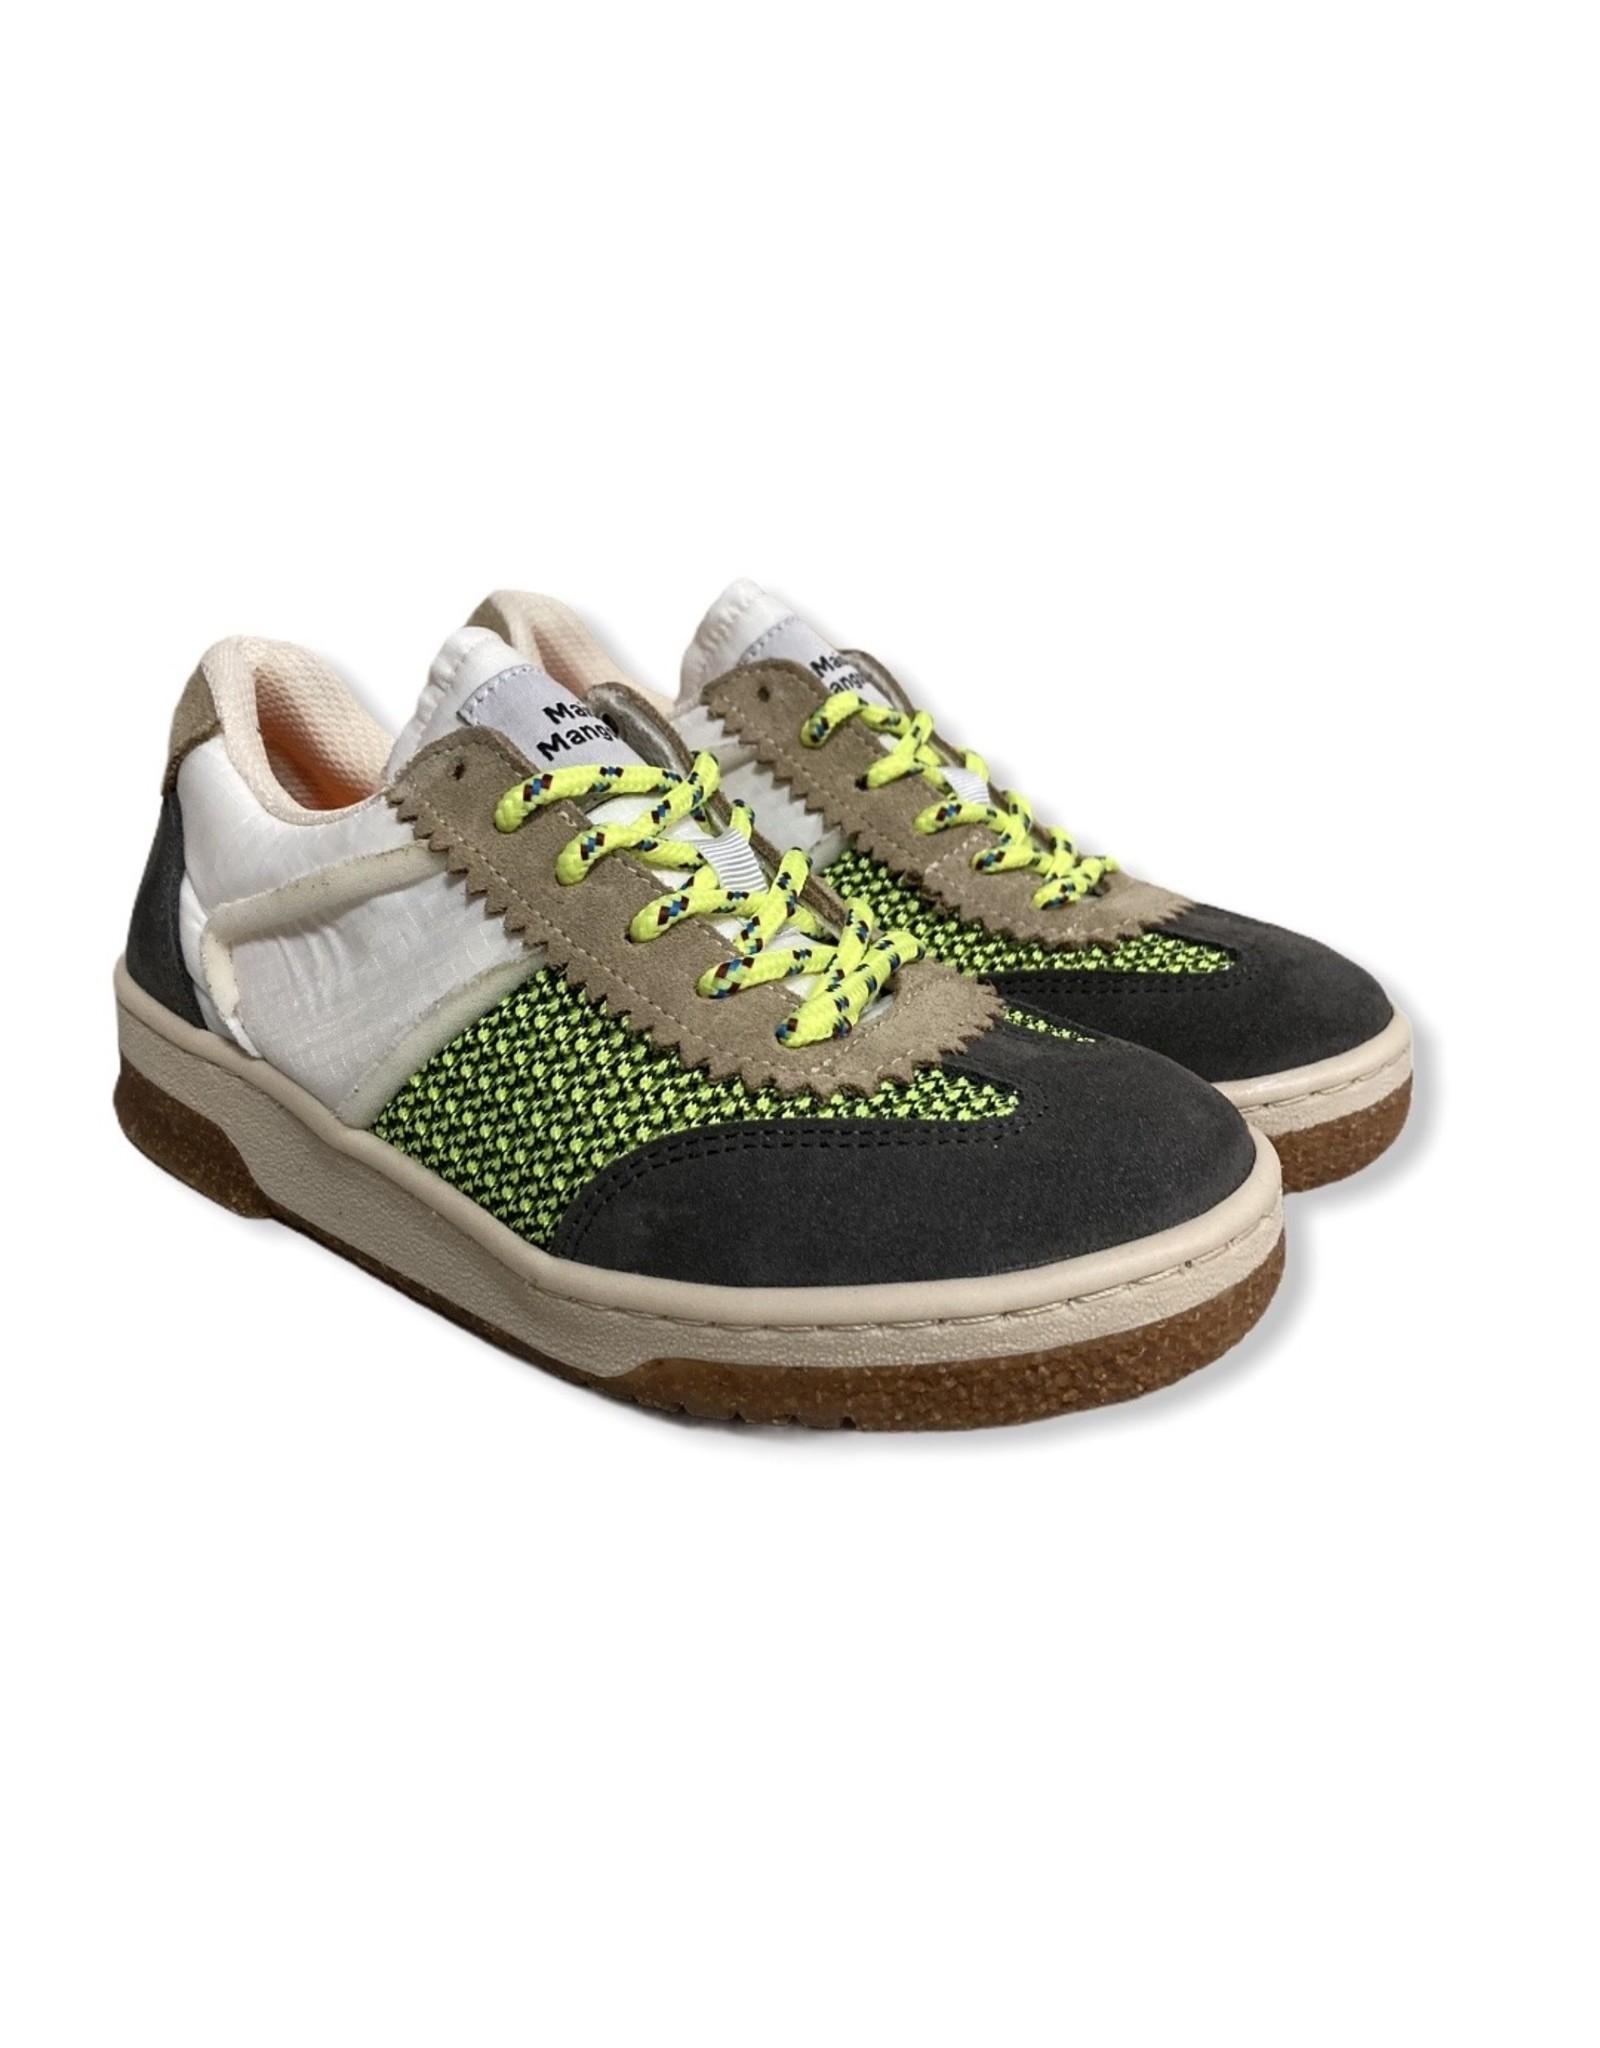 Maison Mangostan Grosella sneaker